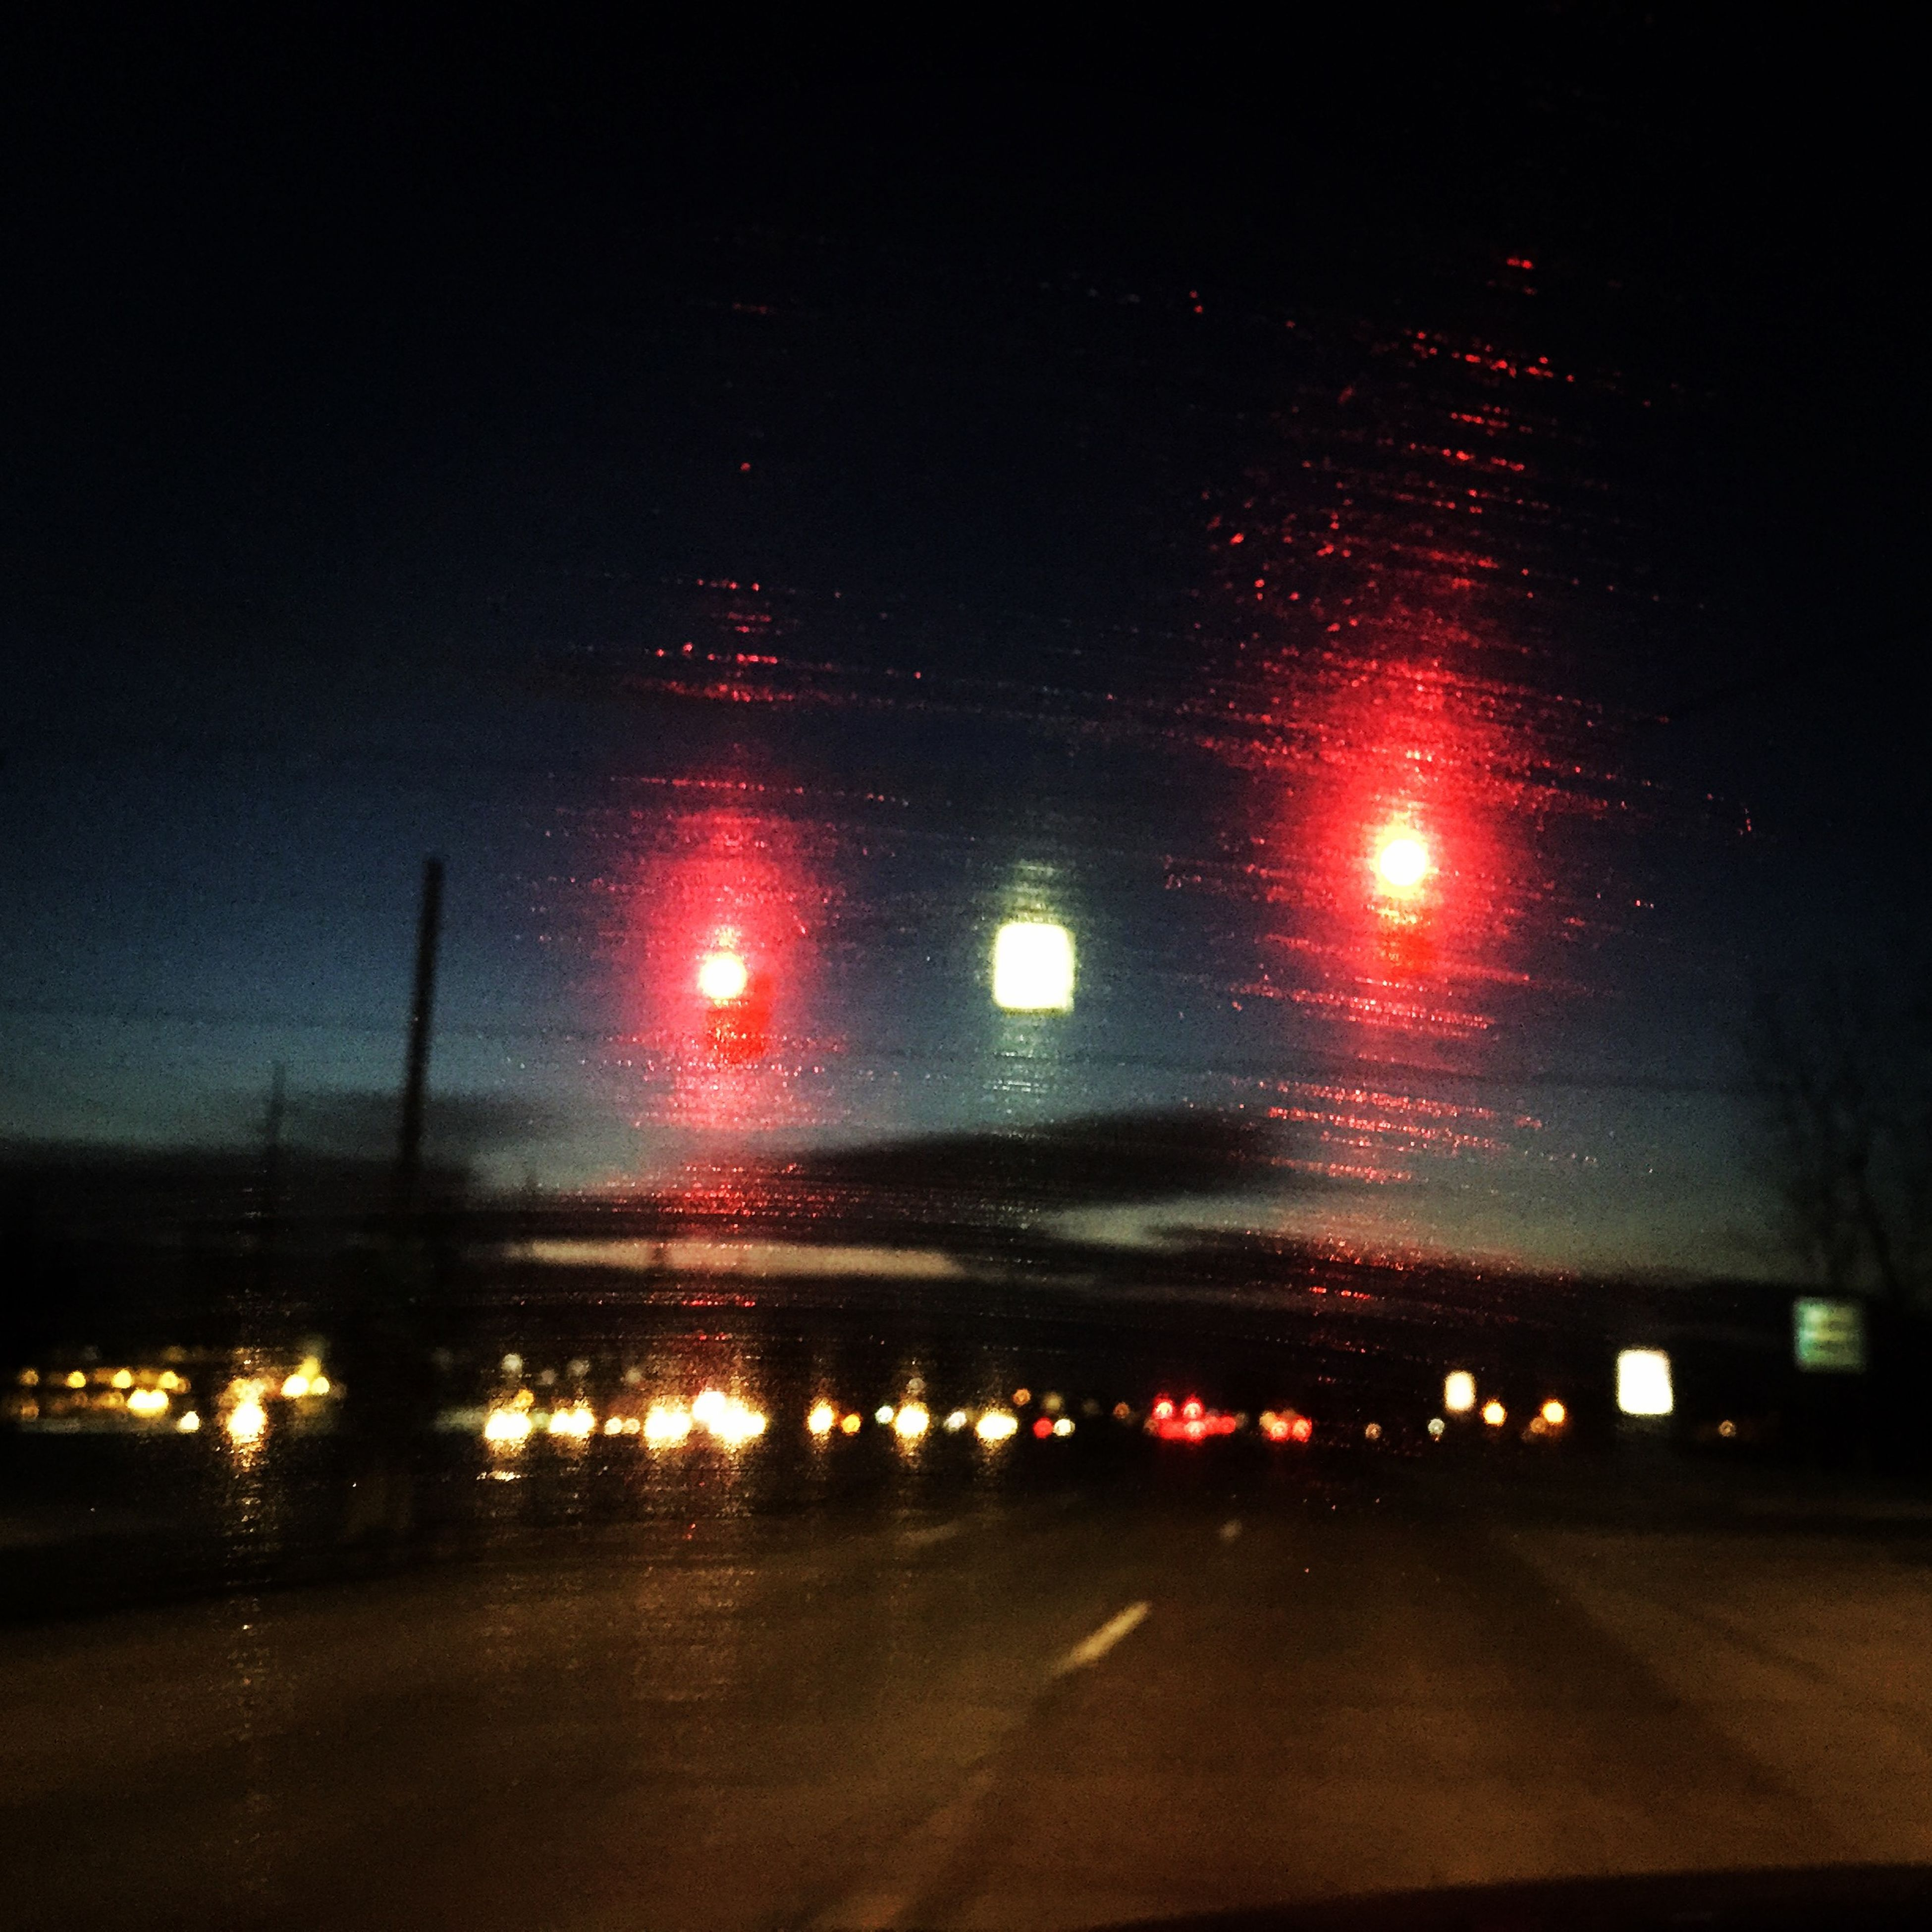 illuminated, night, transportation, water, road, car, street, sky, street light, wet, reflection, mode of transport, rain, sunset, no people, land vehicle, outdoors, lighting equipment, nature, dusk